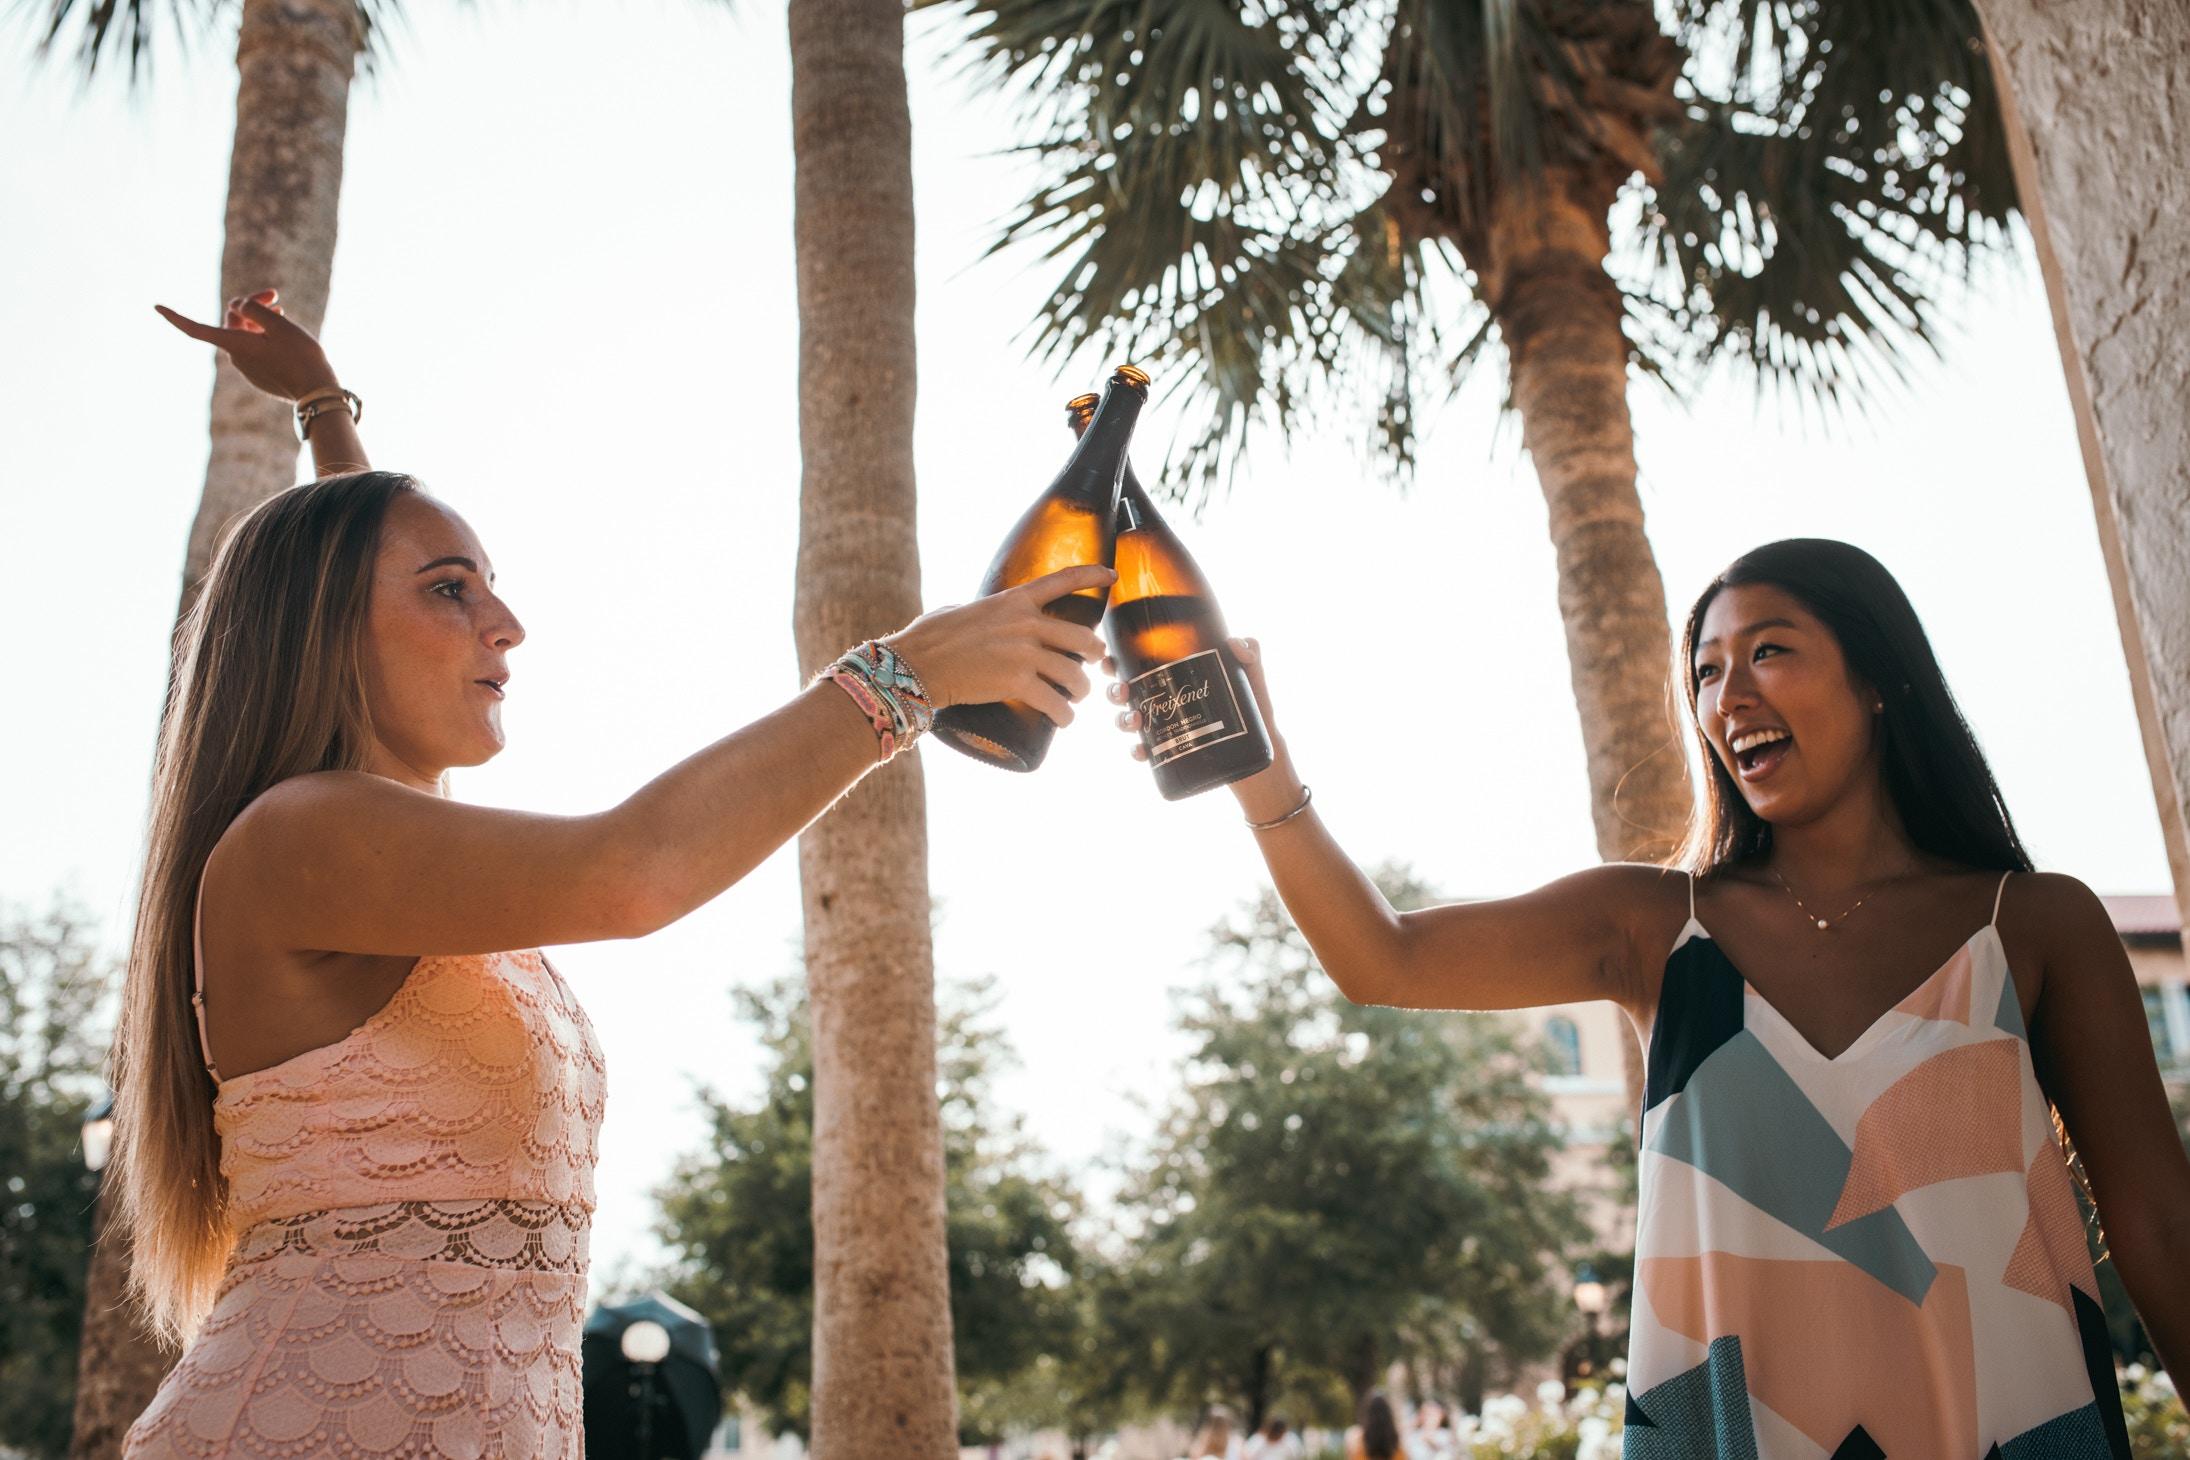 2 women celebrating